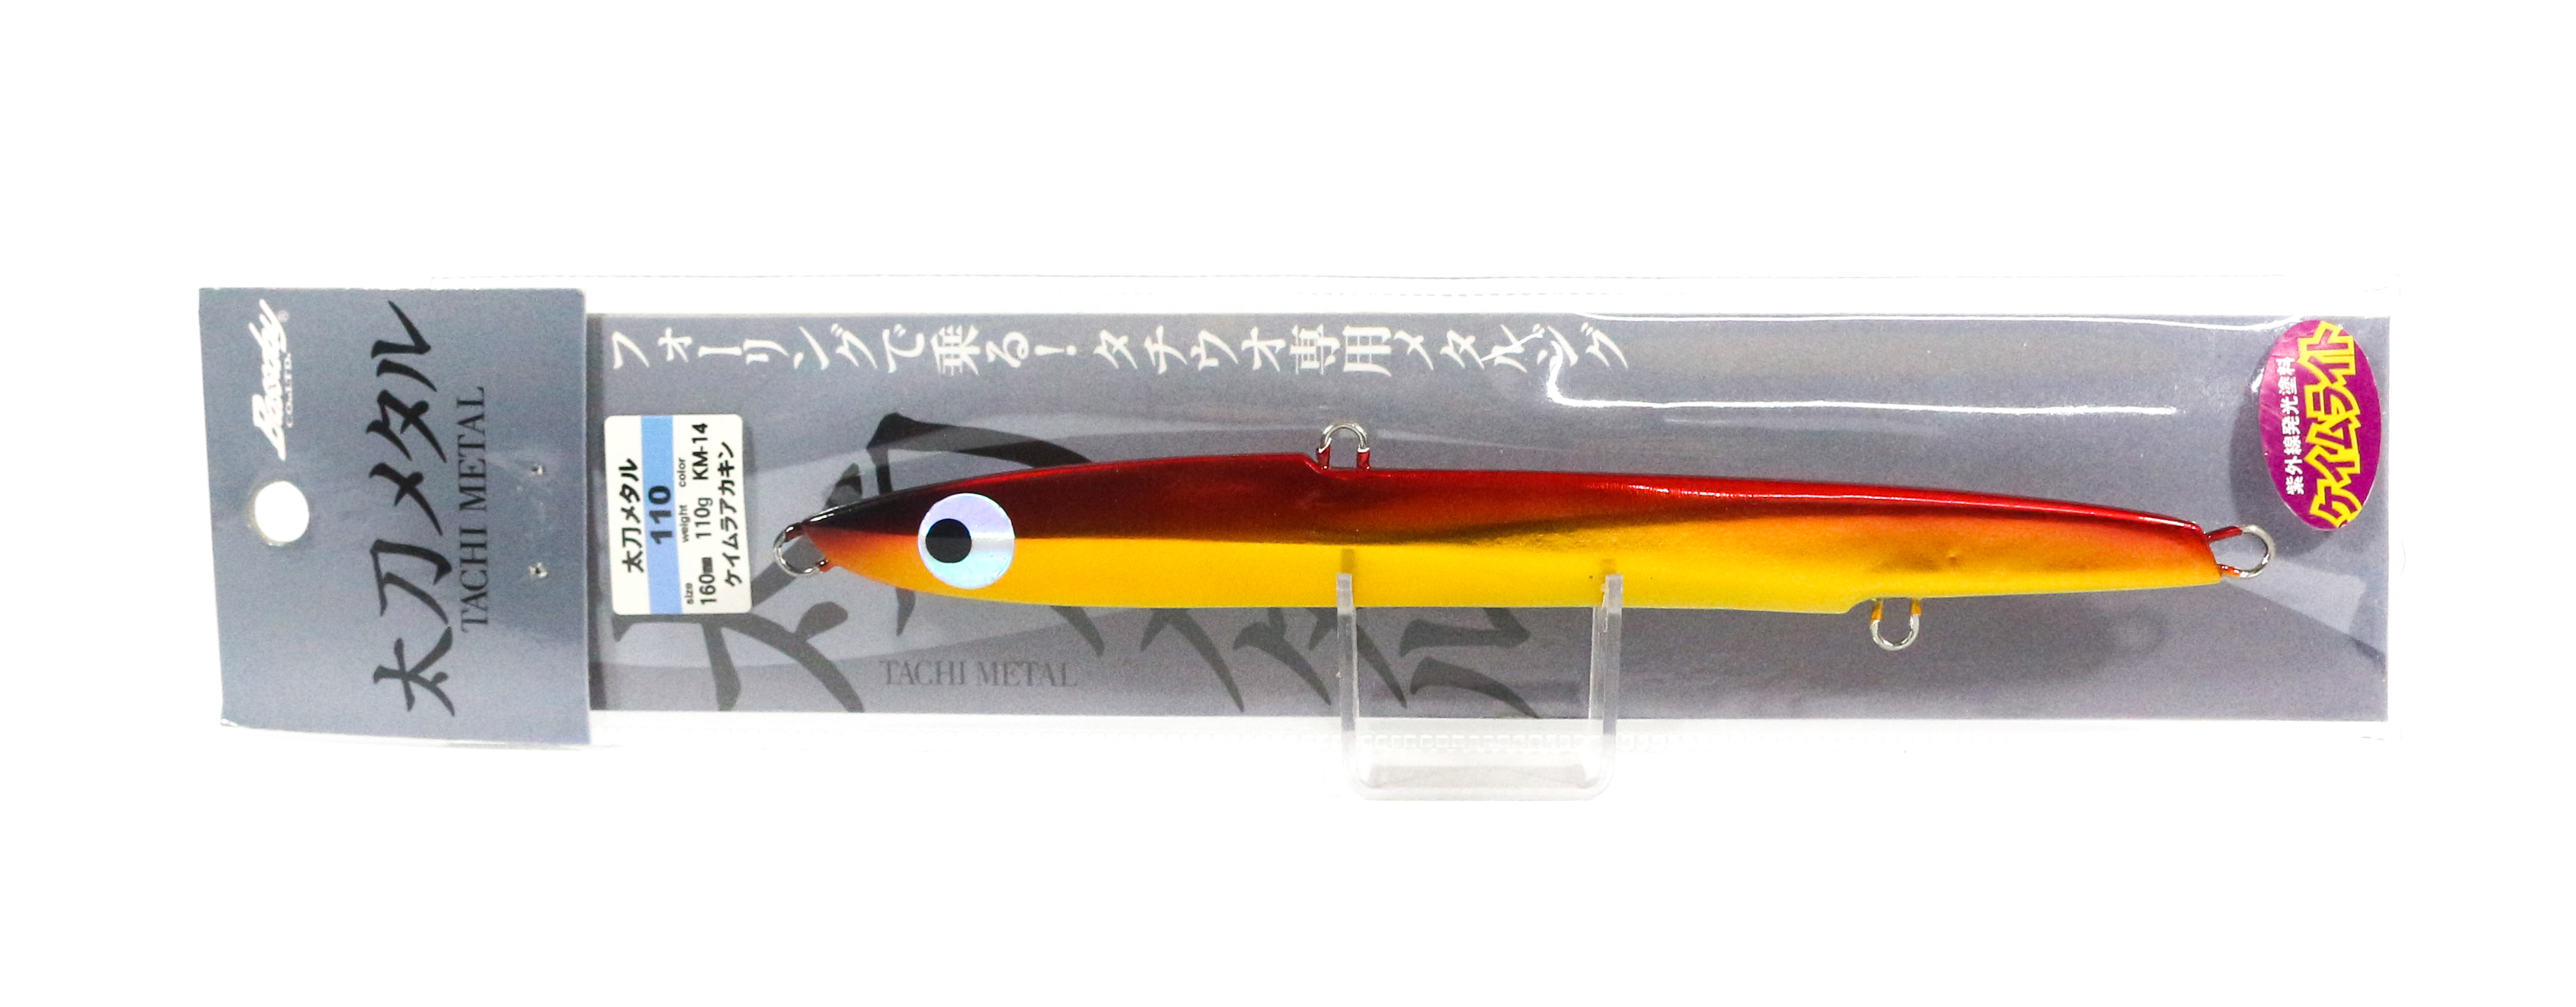 Sale Bassday Metal Jig Tachi Metal 110 grams KM-14 (3116)